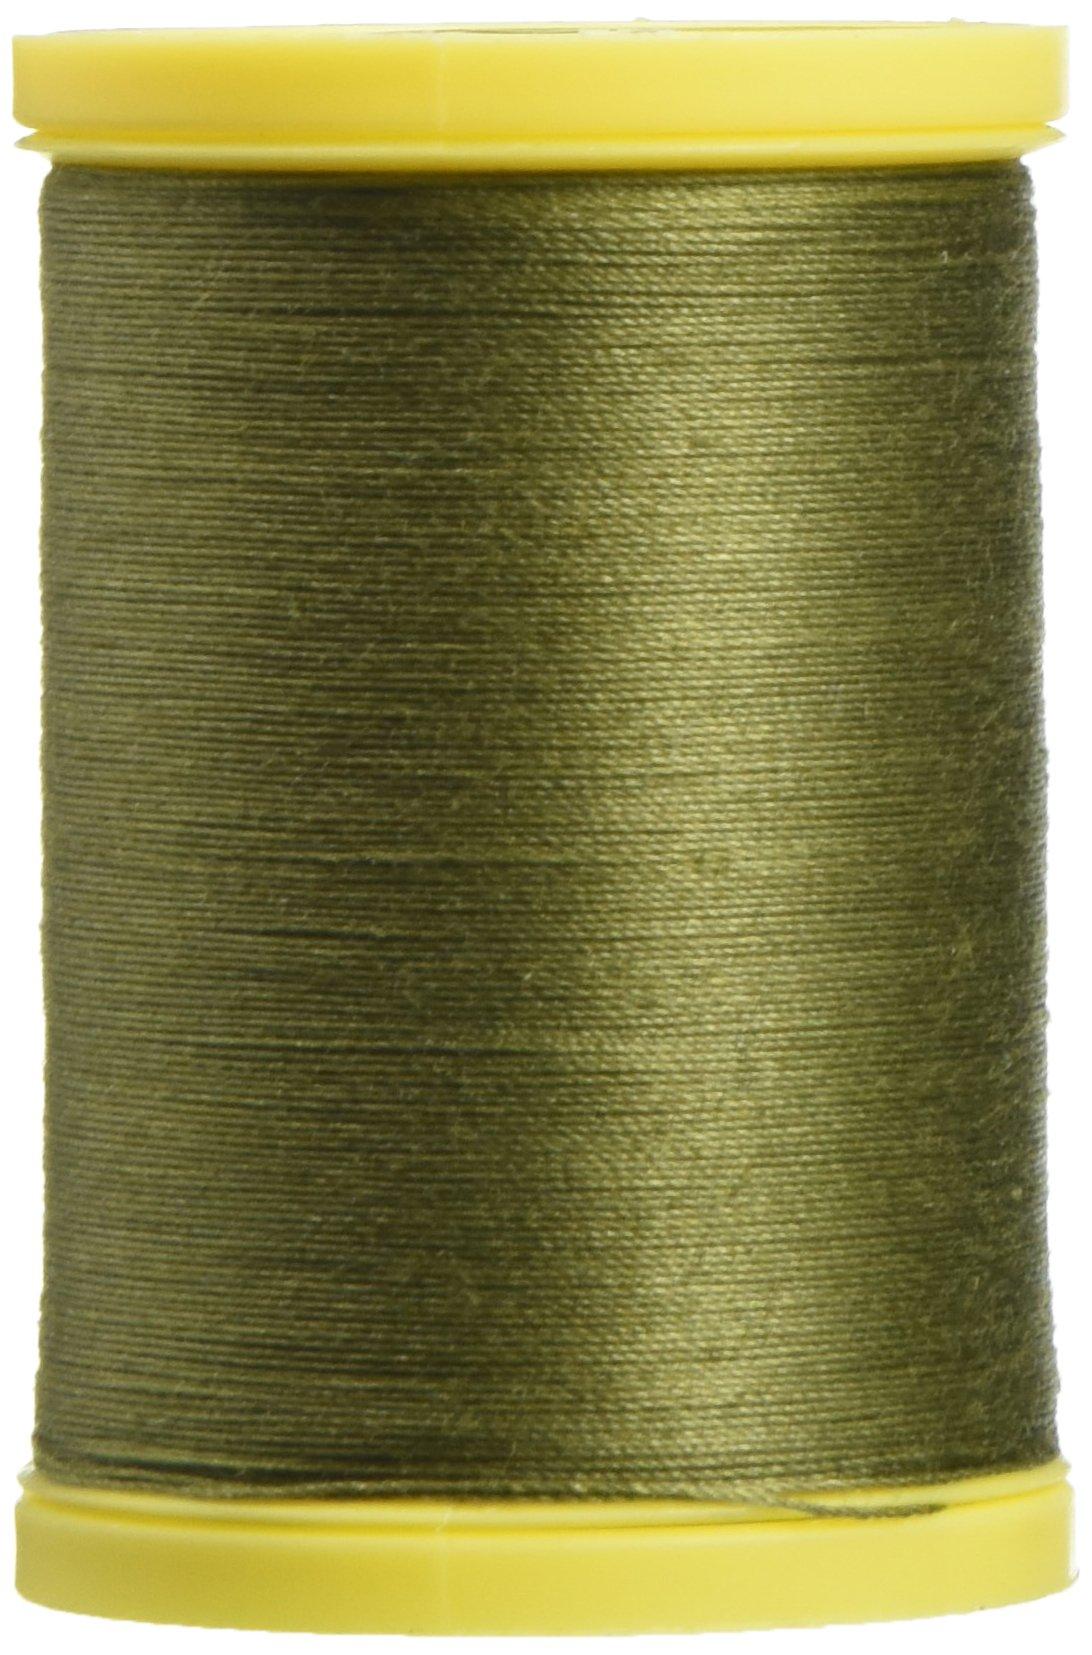 Coats: Thread & Zippers S970-6360 General Purpose Cotton Thread, 225-Yard, Bronze Green